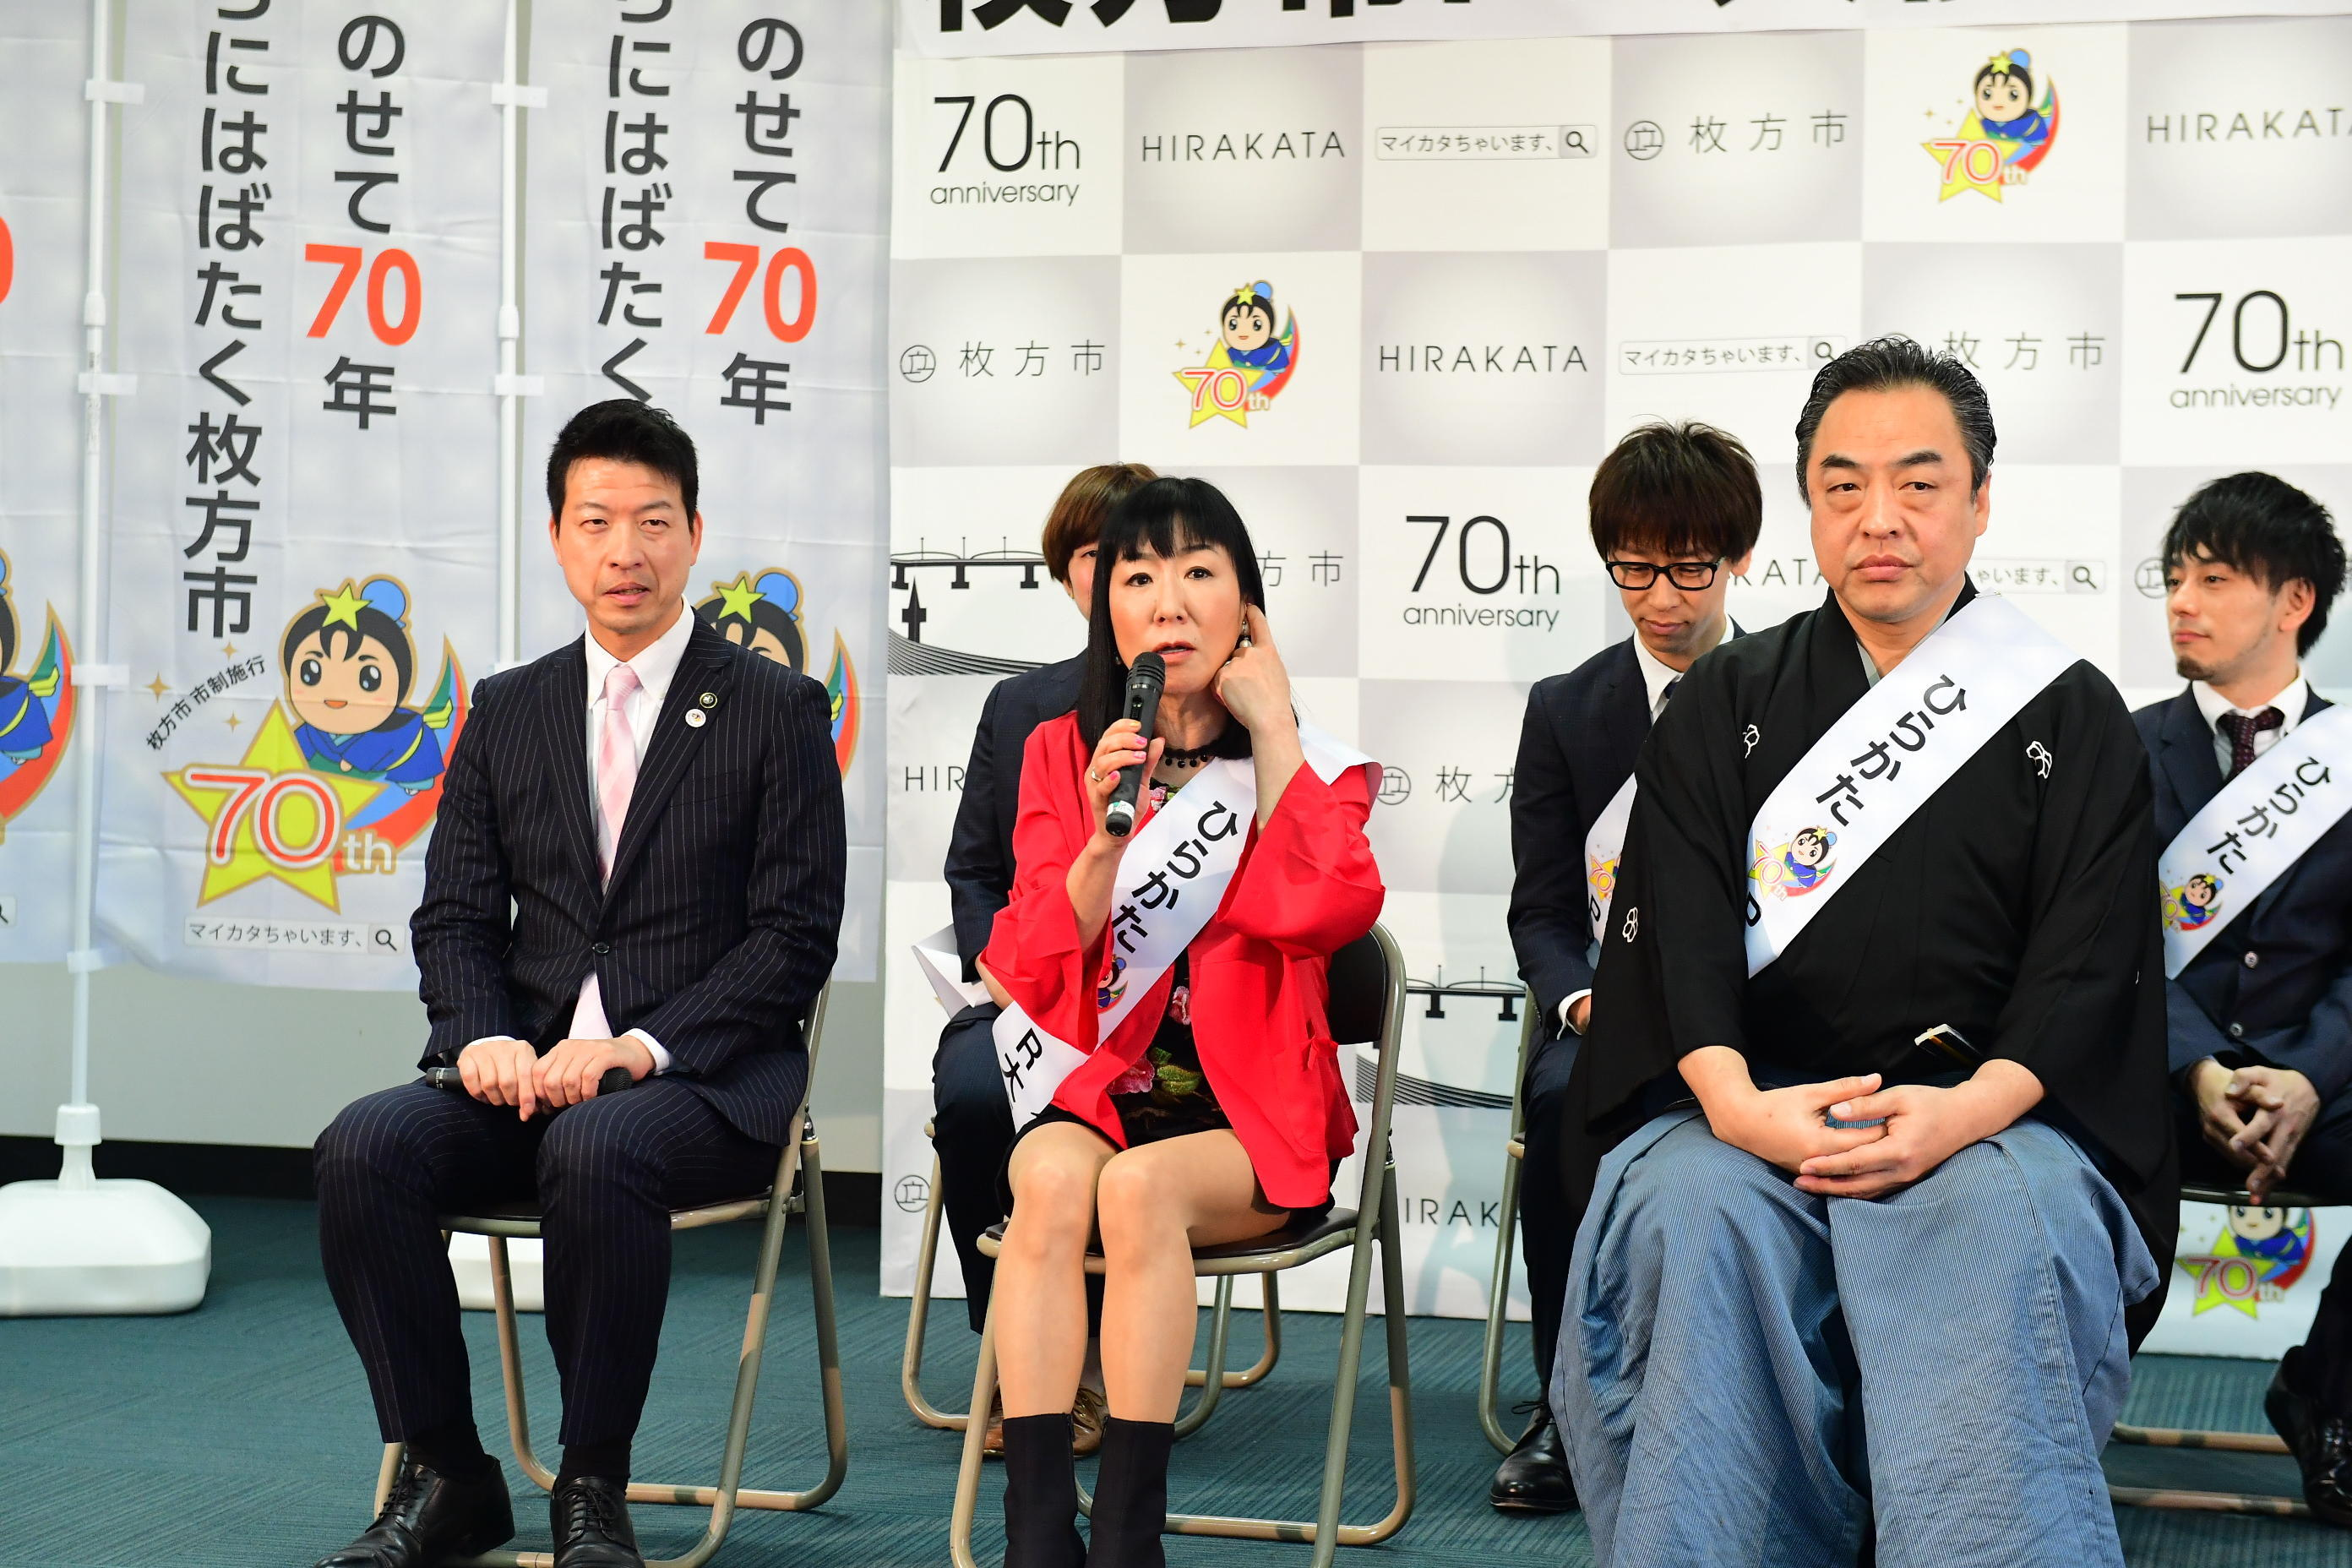 http://news.yoshimoto.co.jp/20170410172830-615aa9b6e412830d701712da35d6c75c8d90f14e.jpg